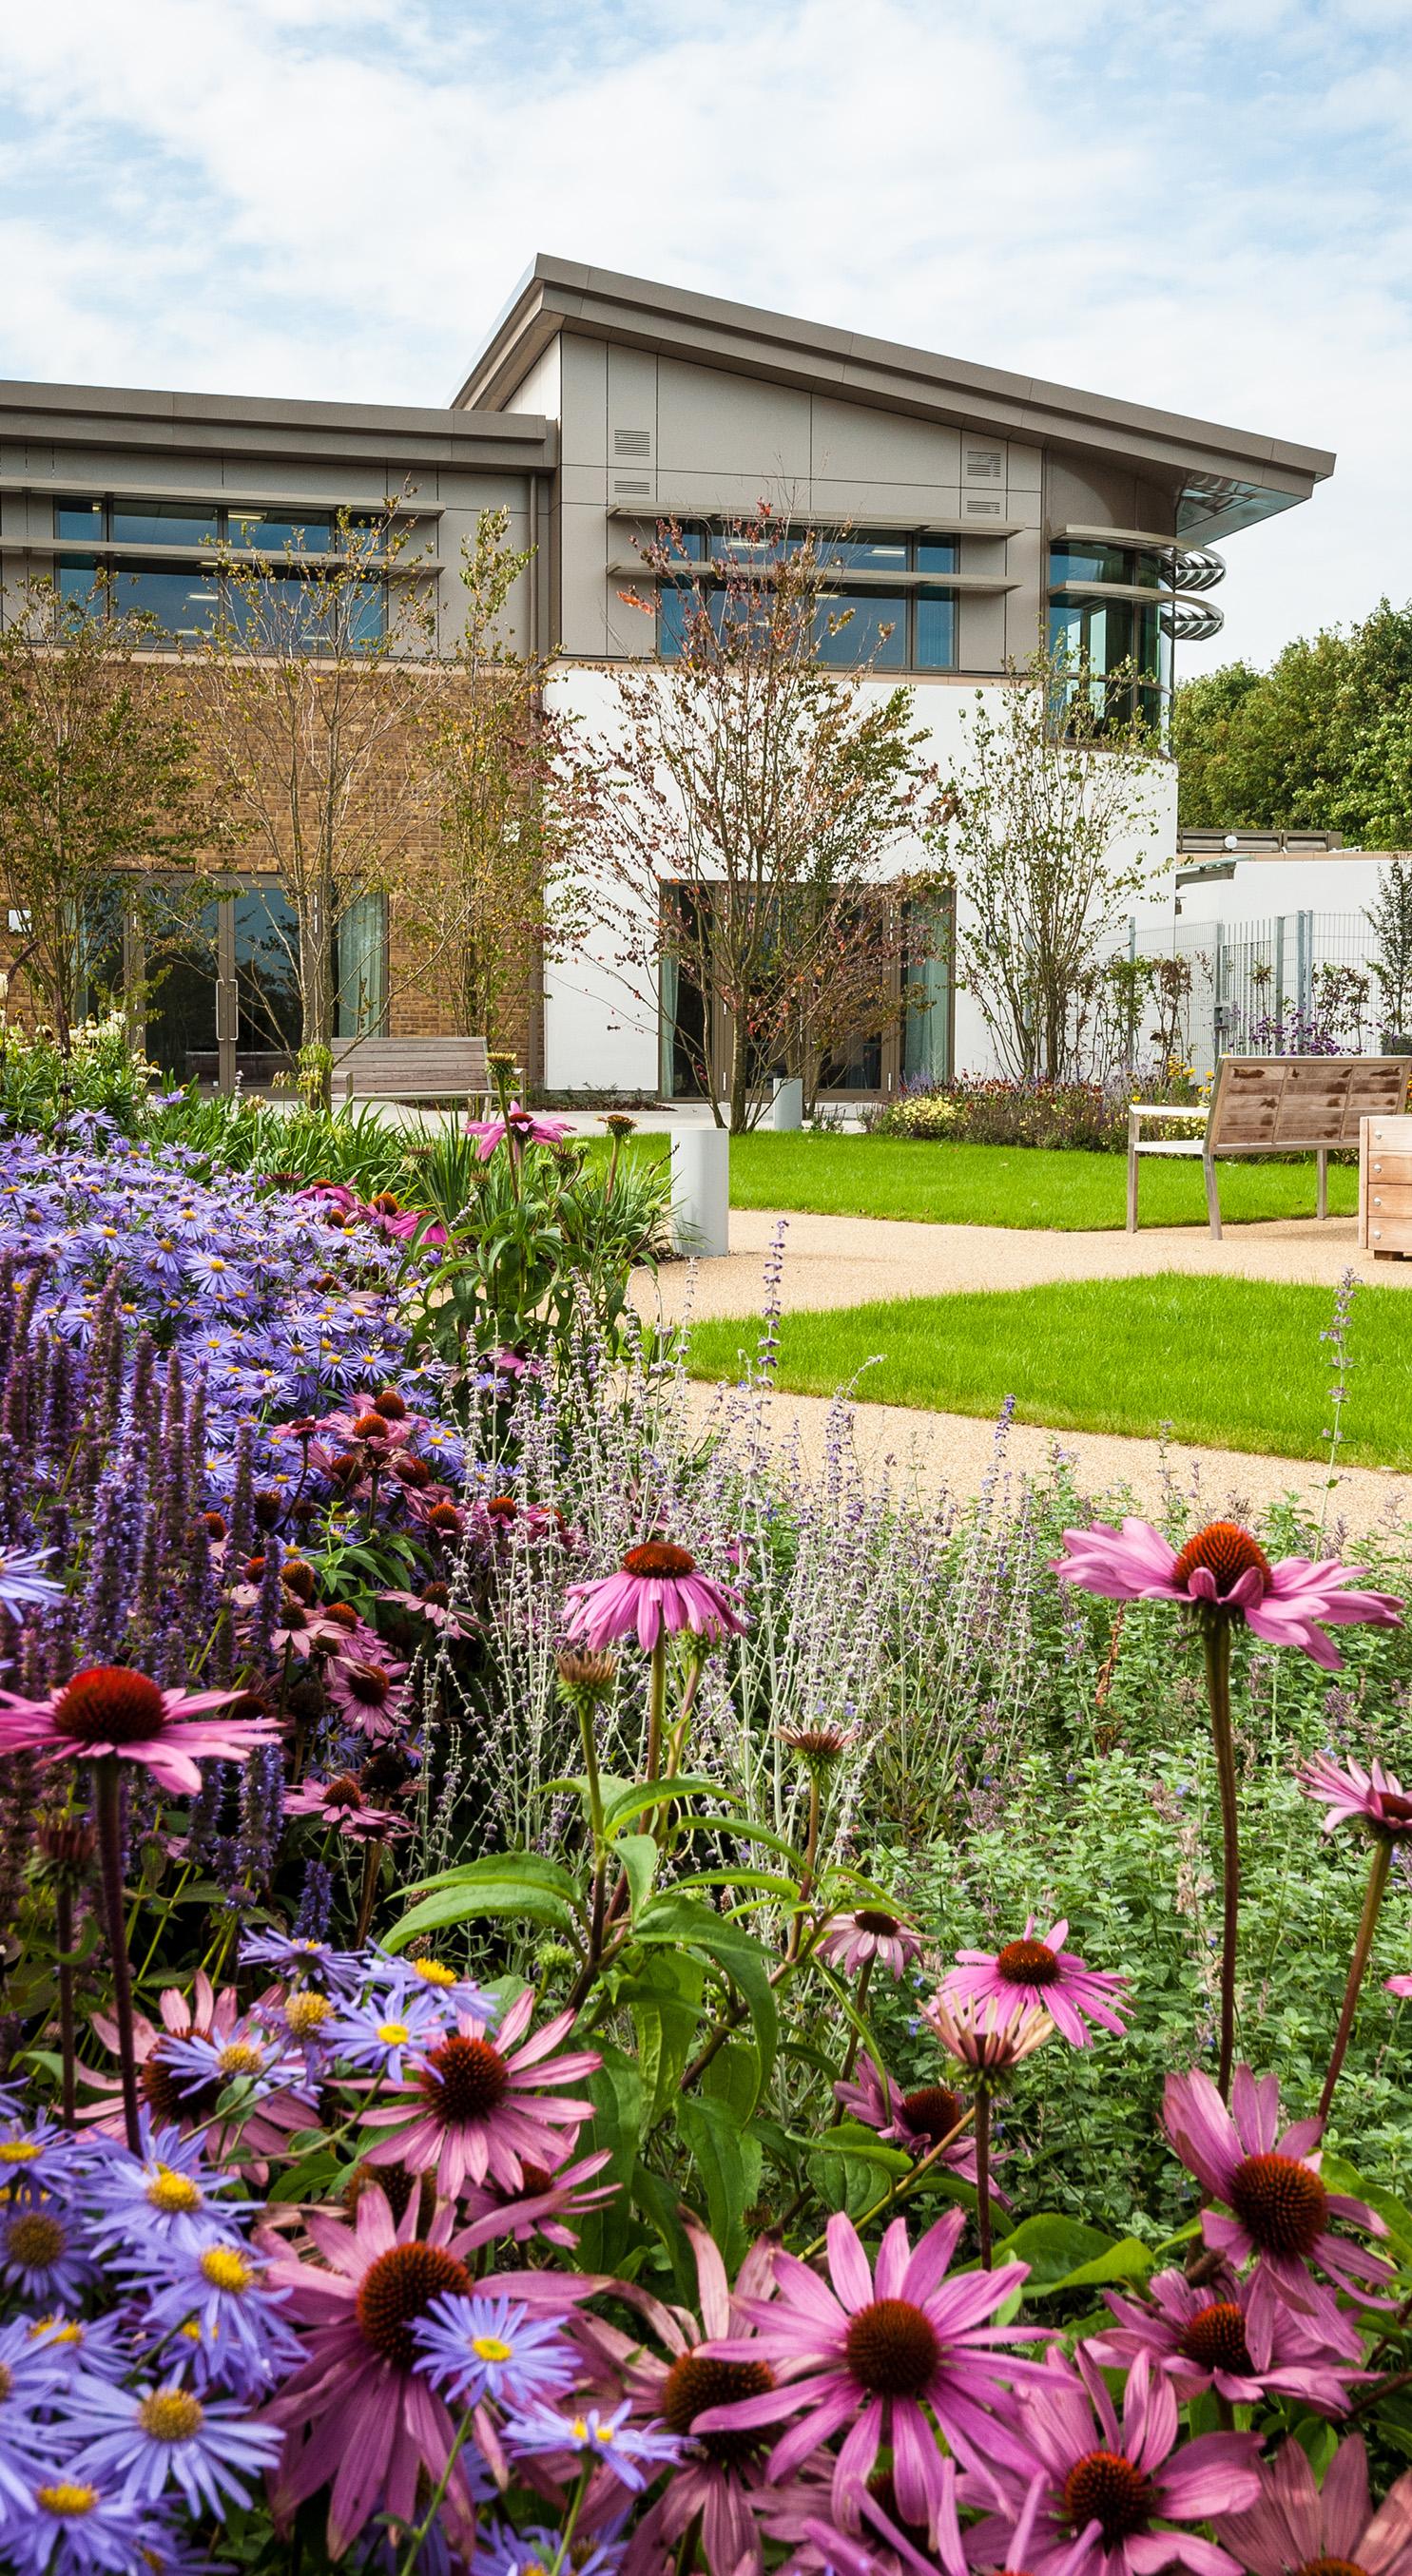 St Wilfrid's Hospice Picks up Sussex Heritage Trust Award